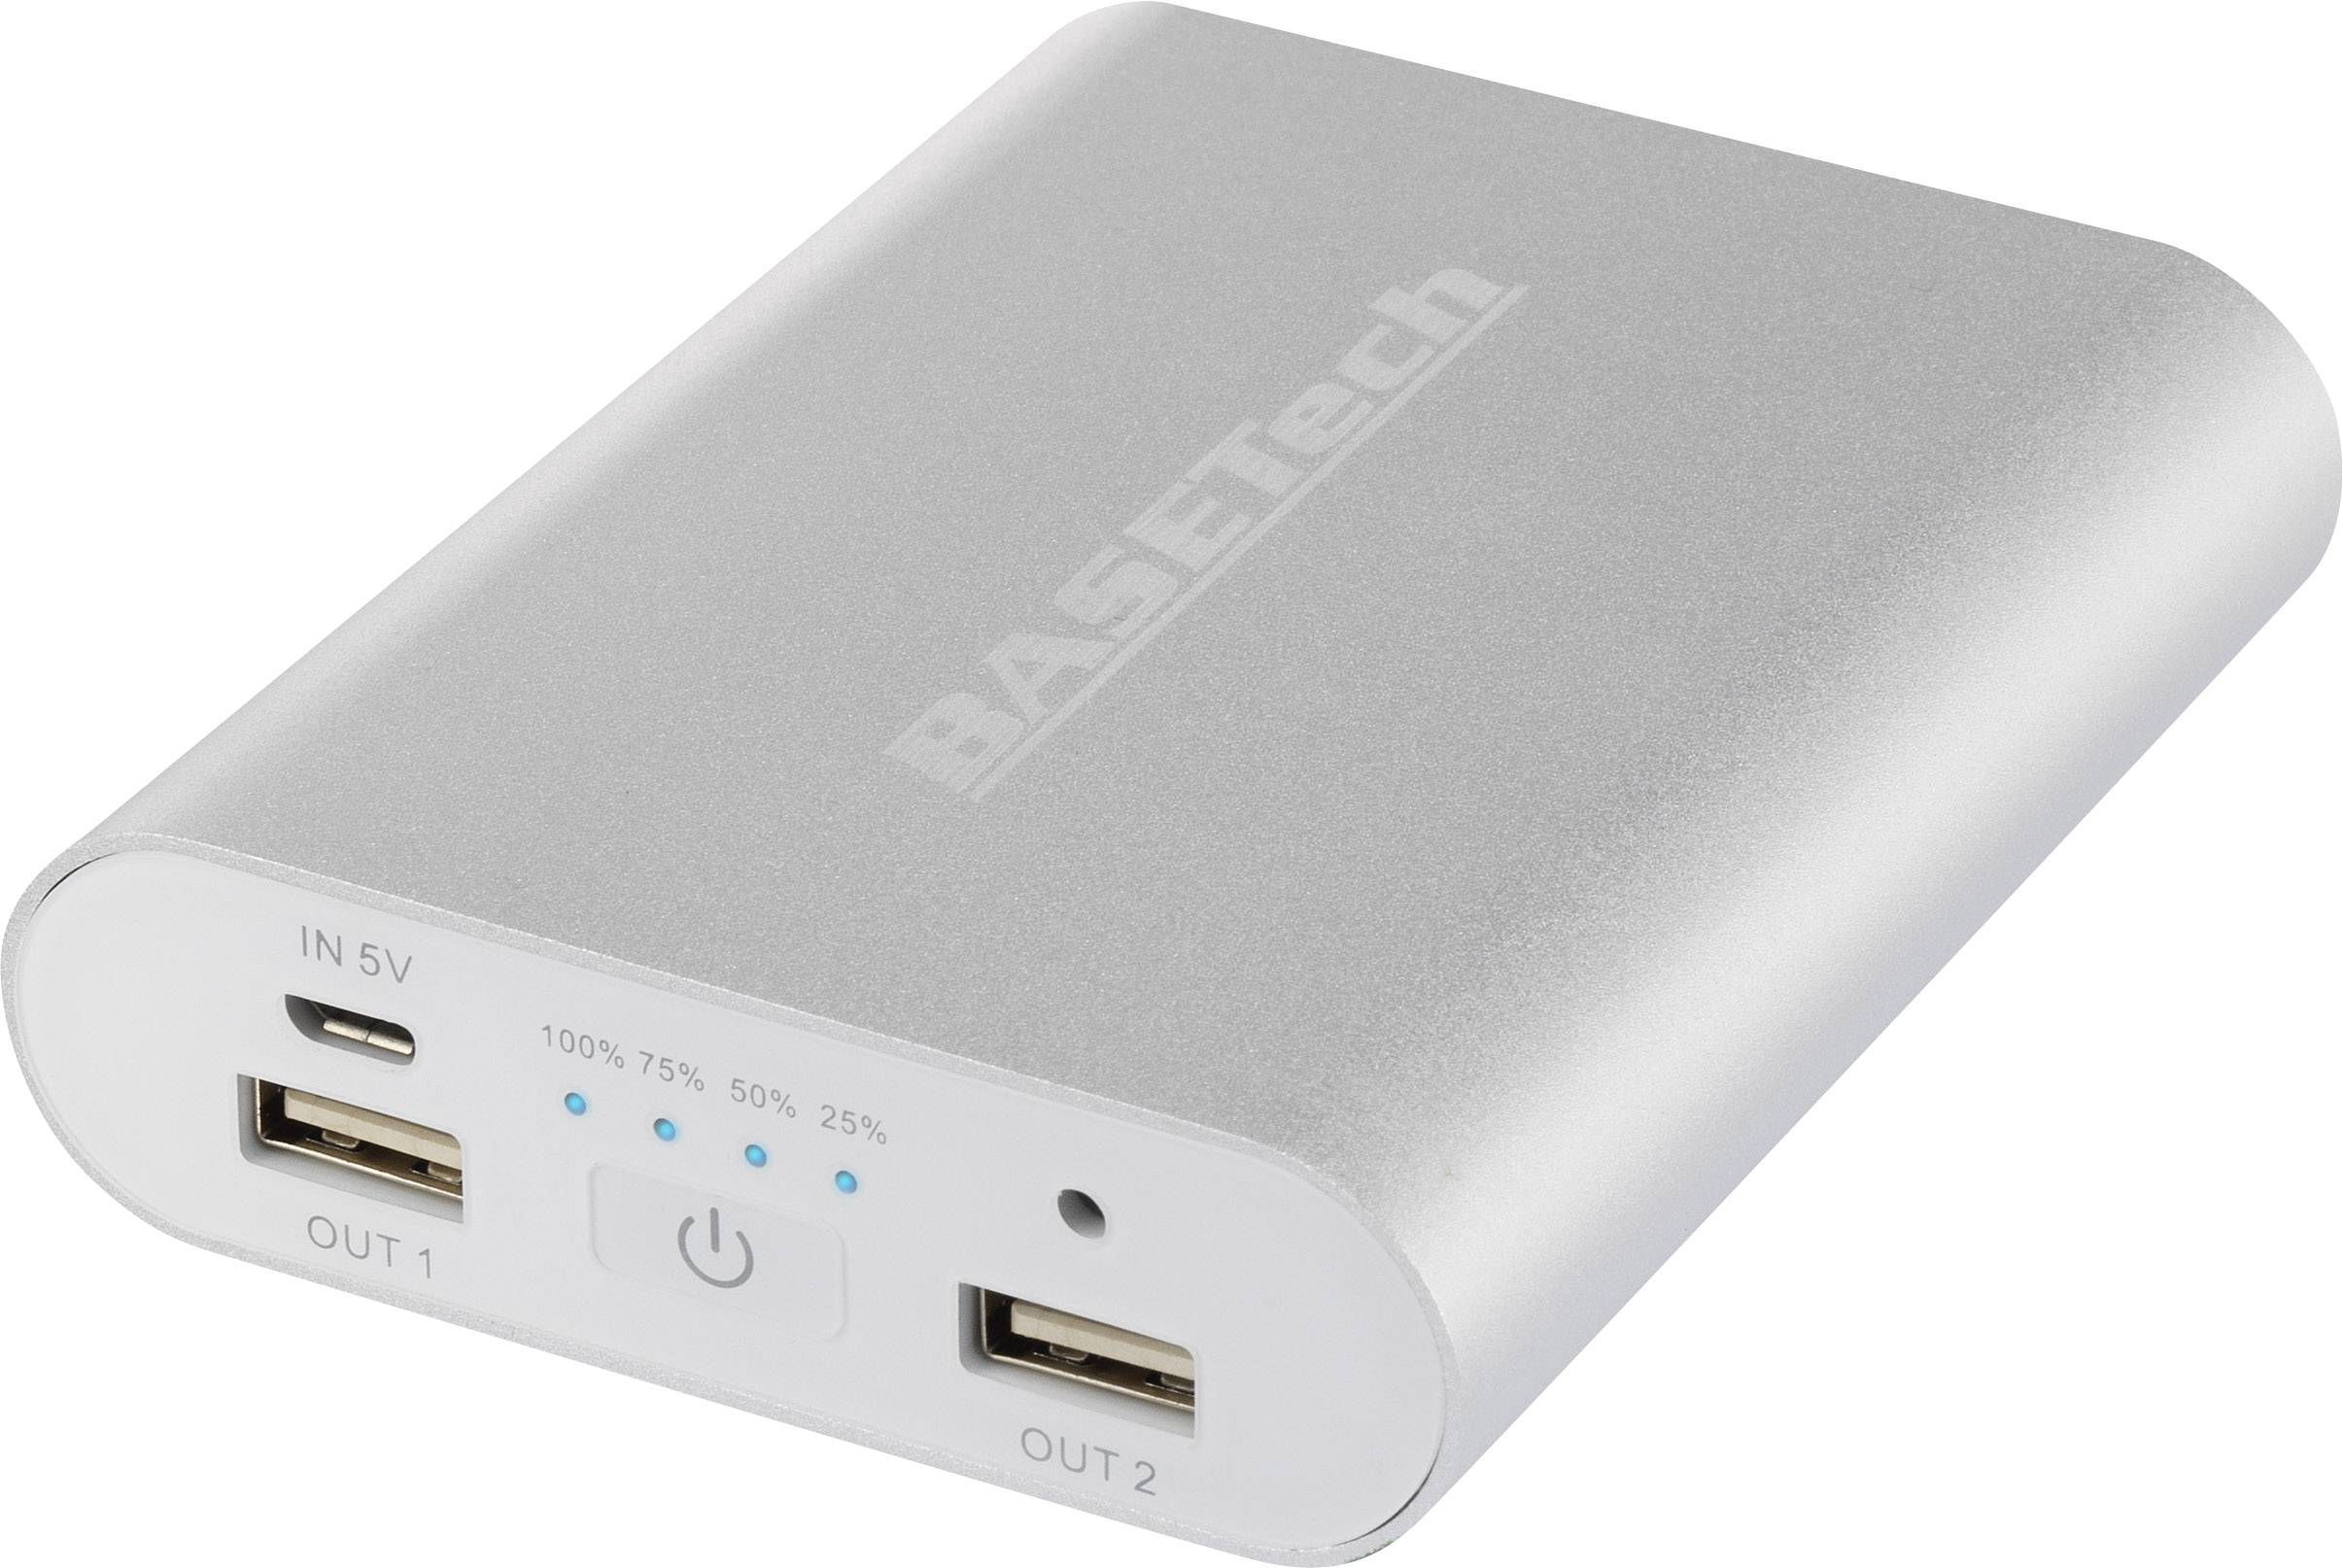 Powerbanka Basetech BTP-3, Li-Ion akumulátor 10400 mAh, strieborná/biela